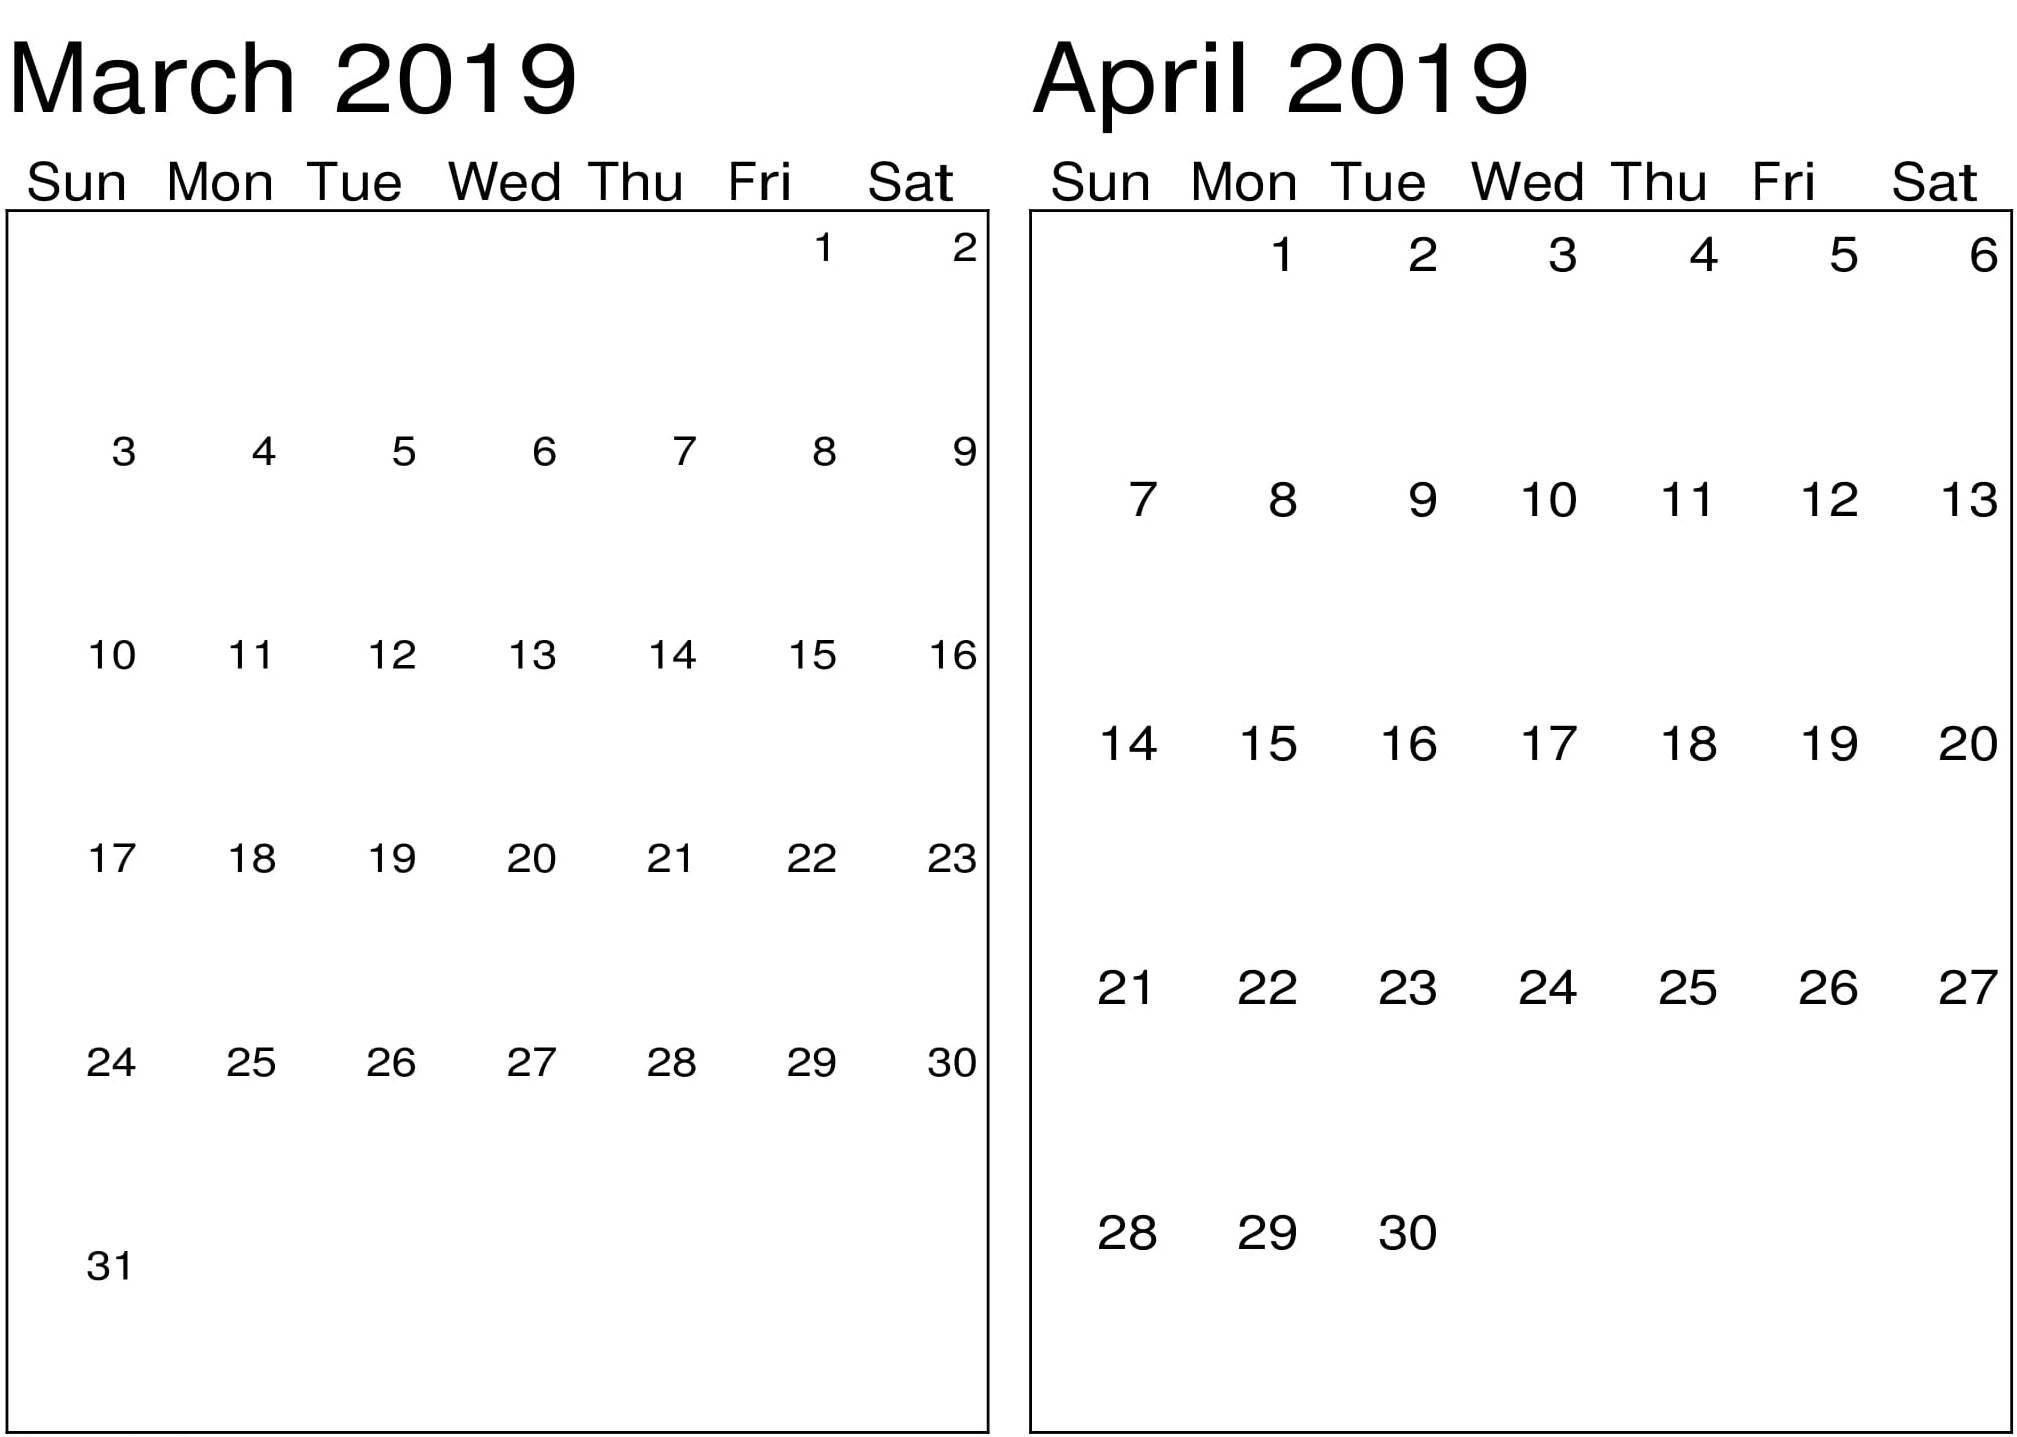 March April 2019 Printable Calendar - Printable Calendar Templates Calendar 2019 March April